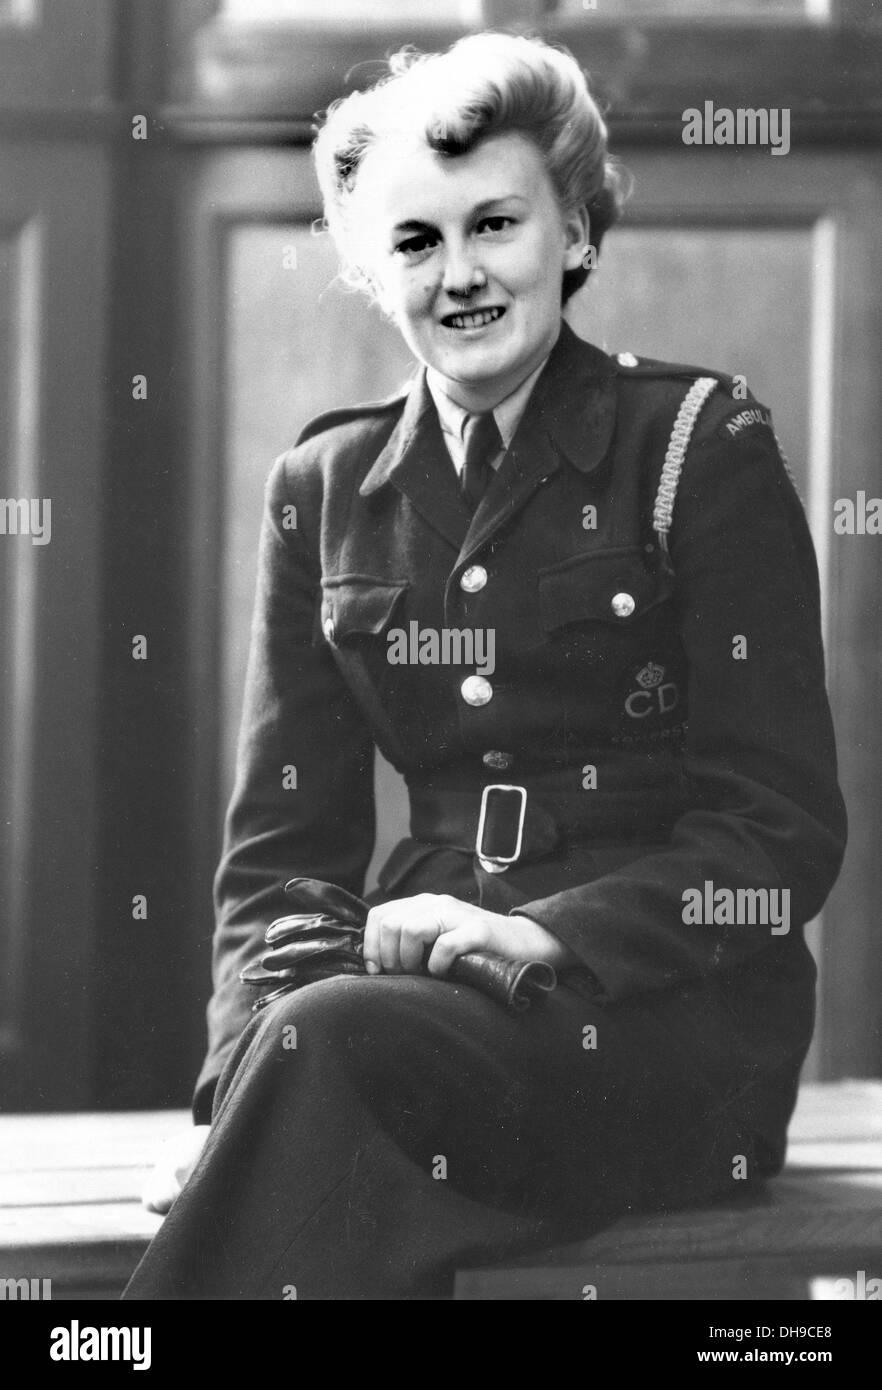 A WW2 Civil Defence Air Raid Protection unit Ambulance driver in uniform - Stock Image